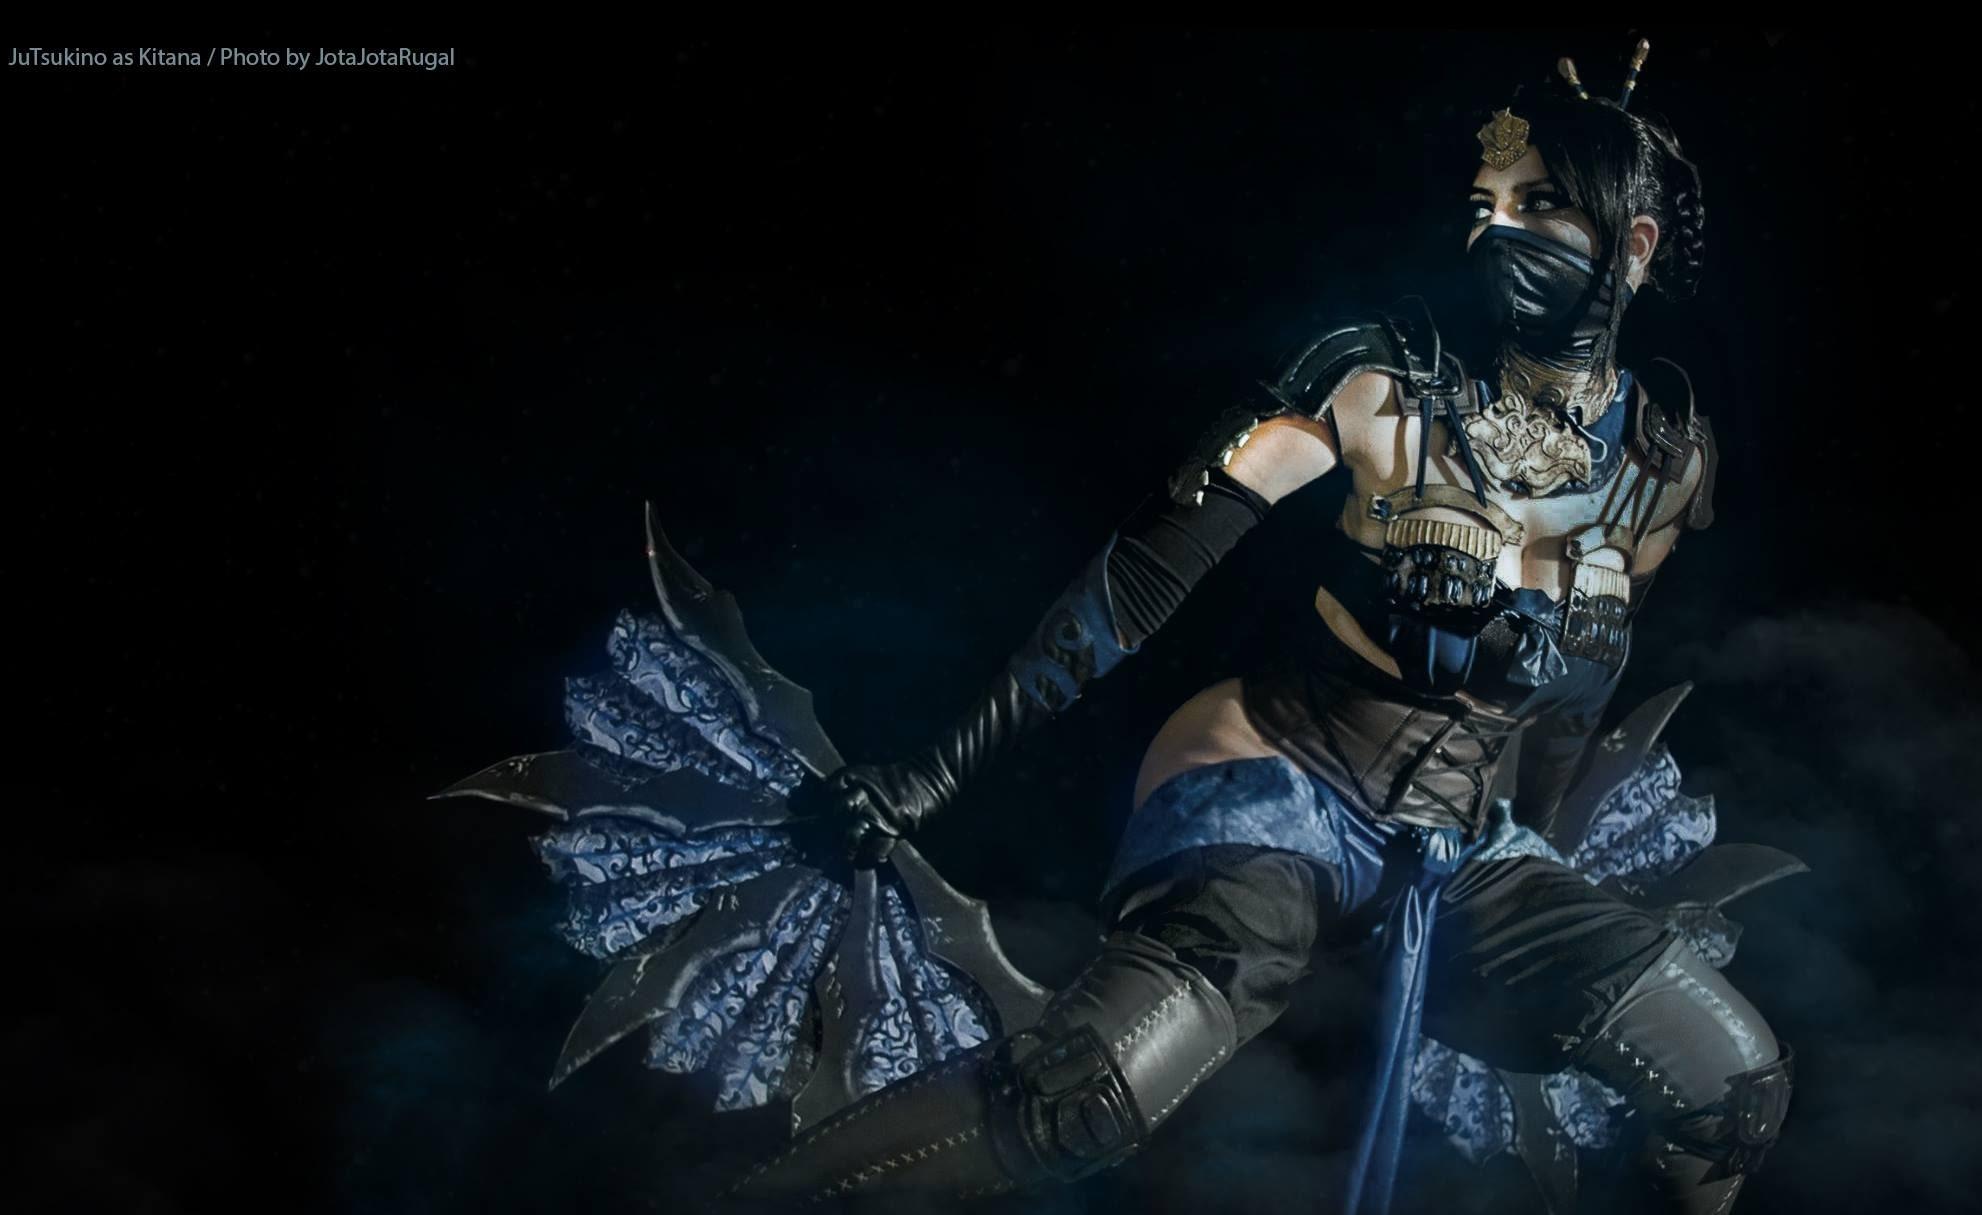 1920x1080 Raiden Mortal Kombat X Characters Wallpapers HD